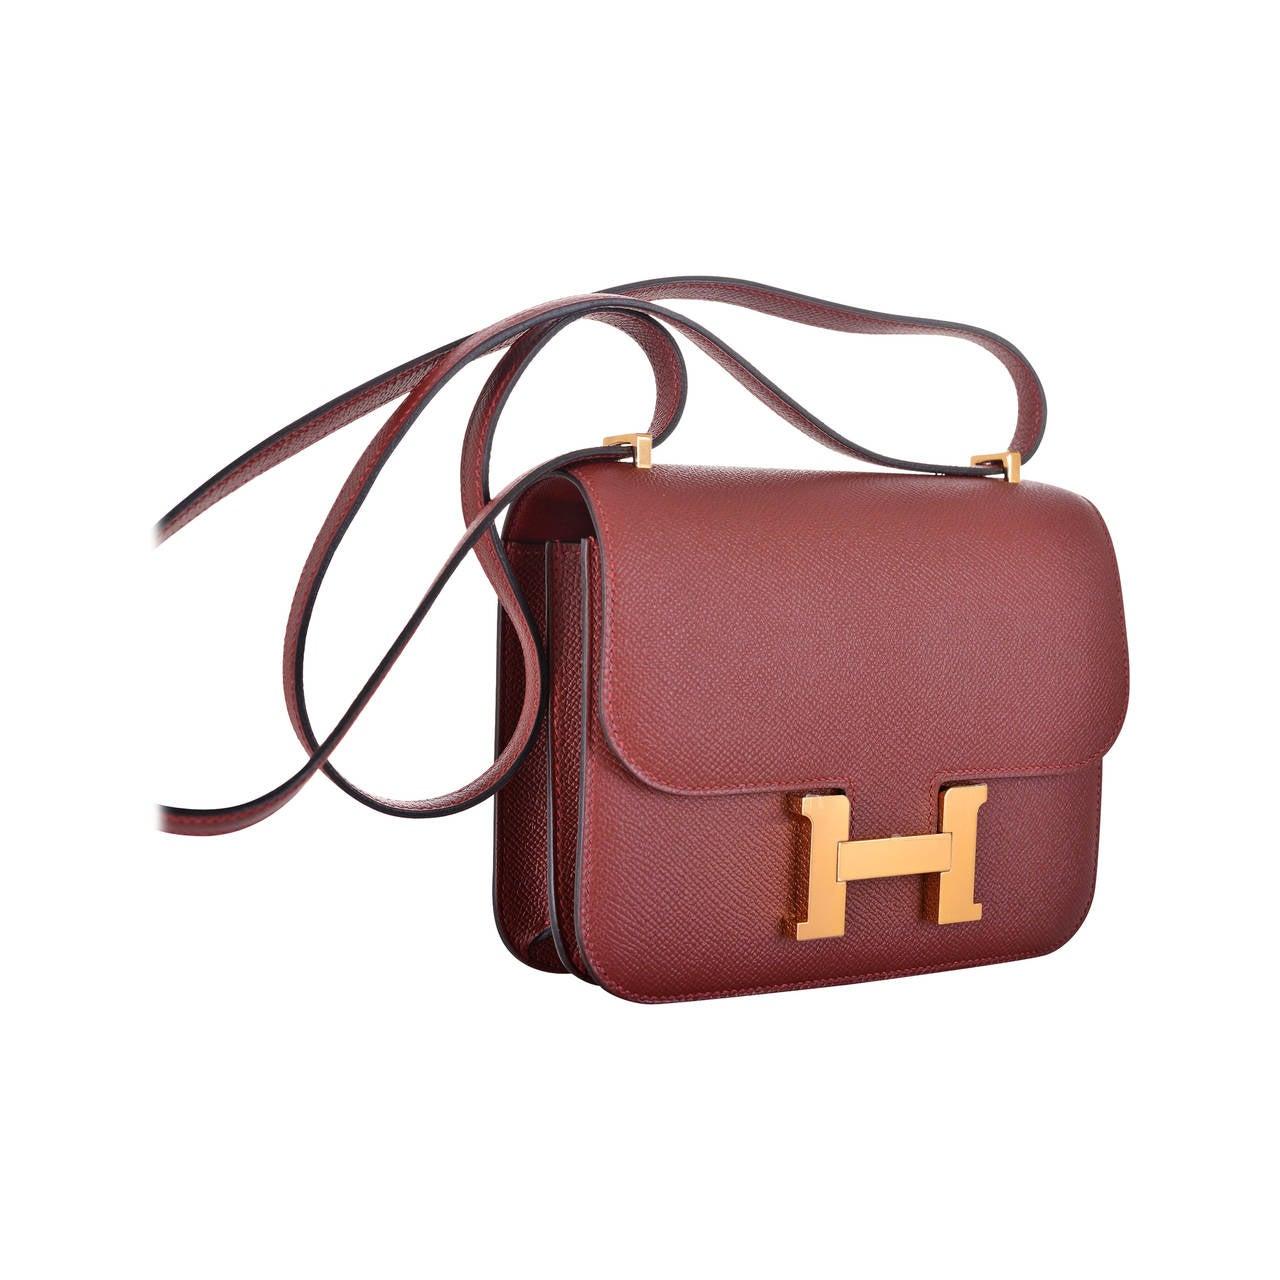 hermes constance bag 24cm double gusset sapphire epsom leather